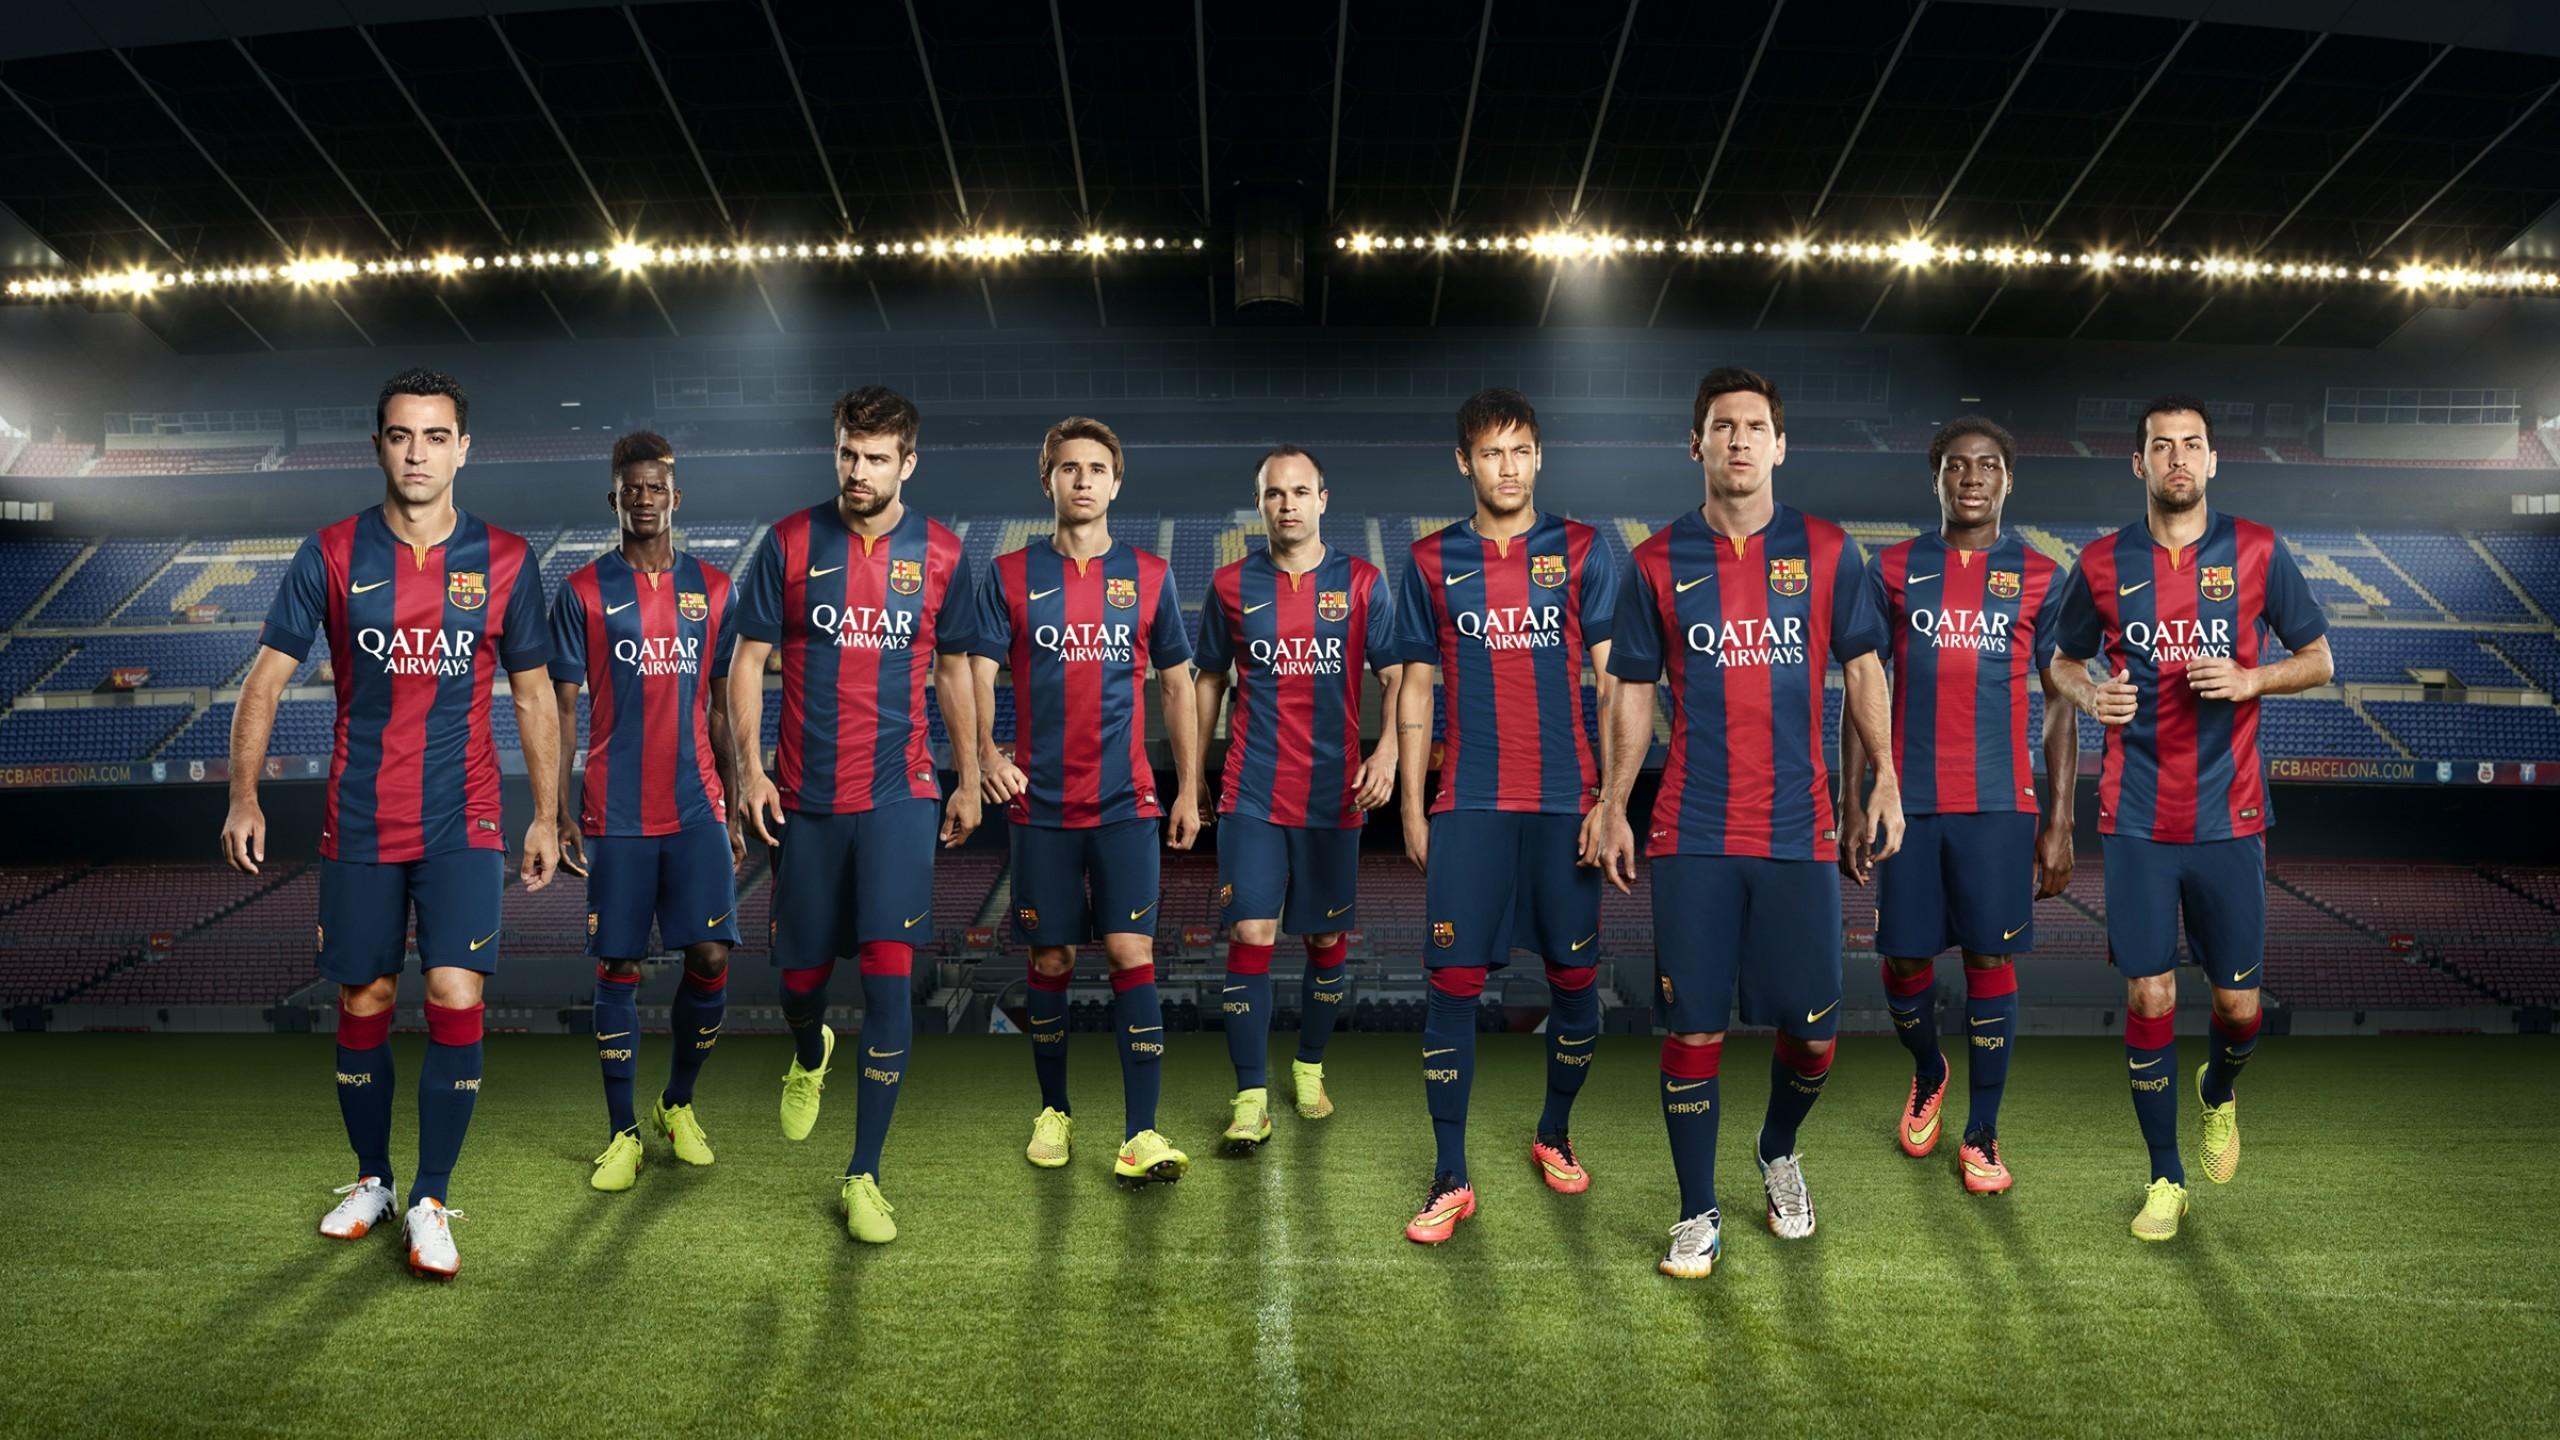 FC Barcelona, Andres Iniesta, Camp Nou, Gerard Pique, Lionel Messi, Neymar